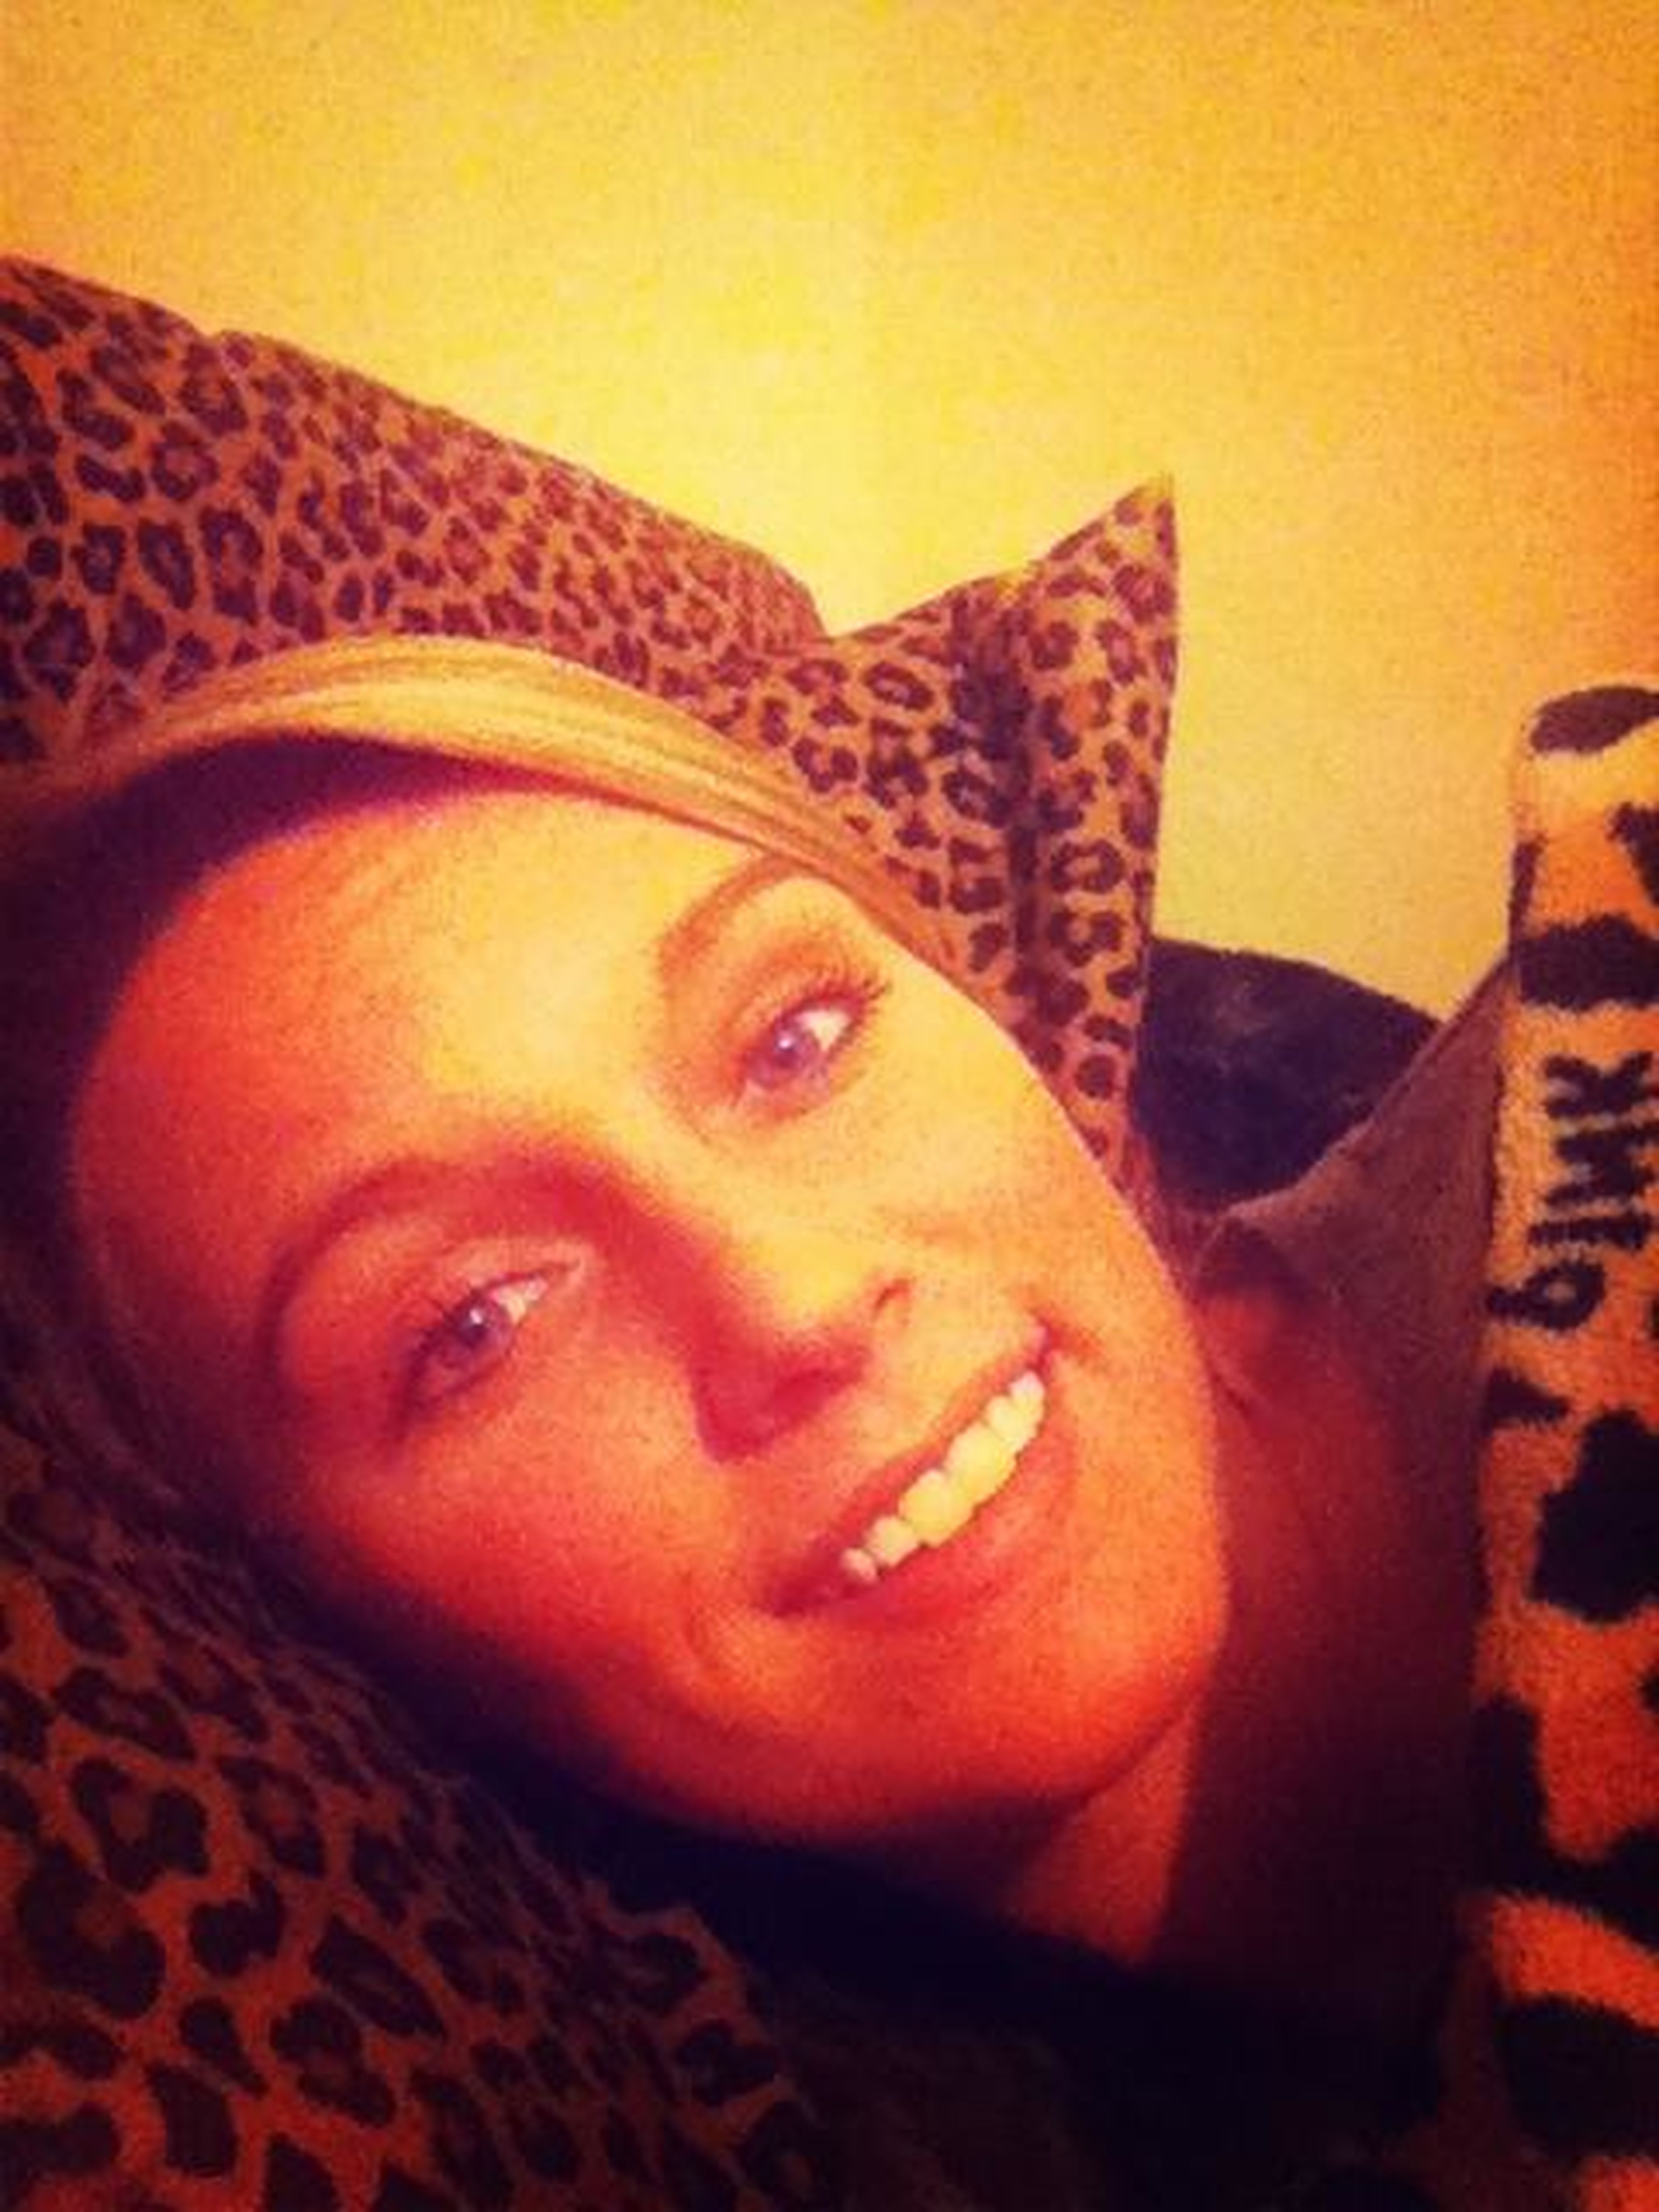 Cheetah Pillow & Cheetah Blanket